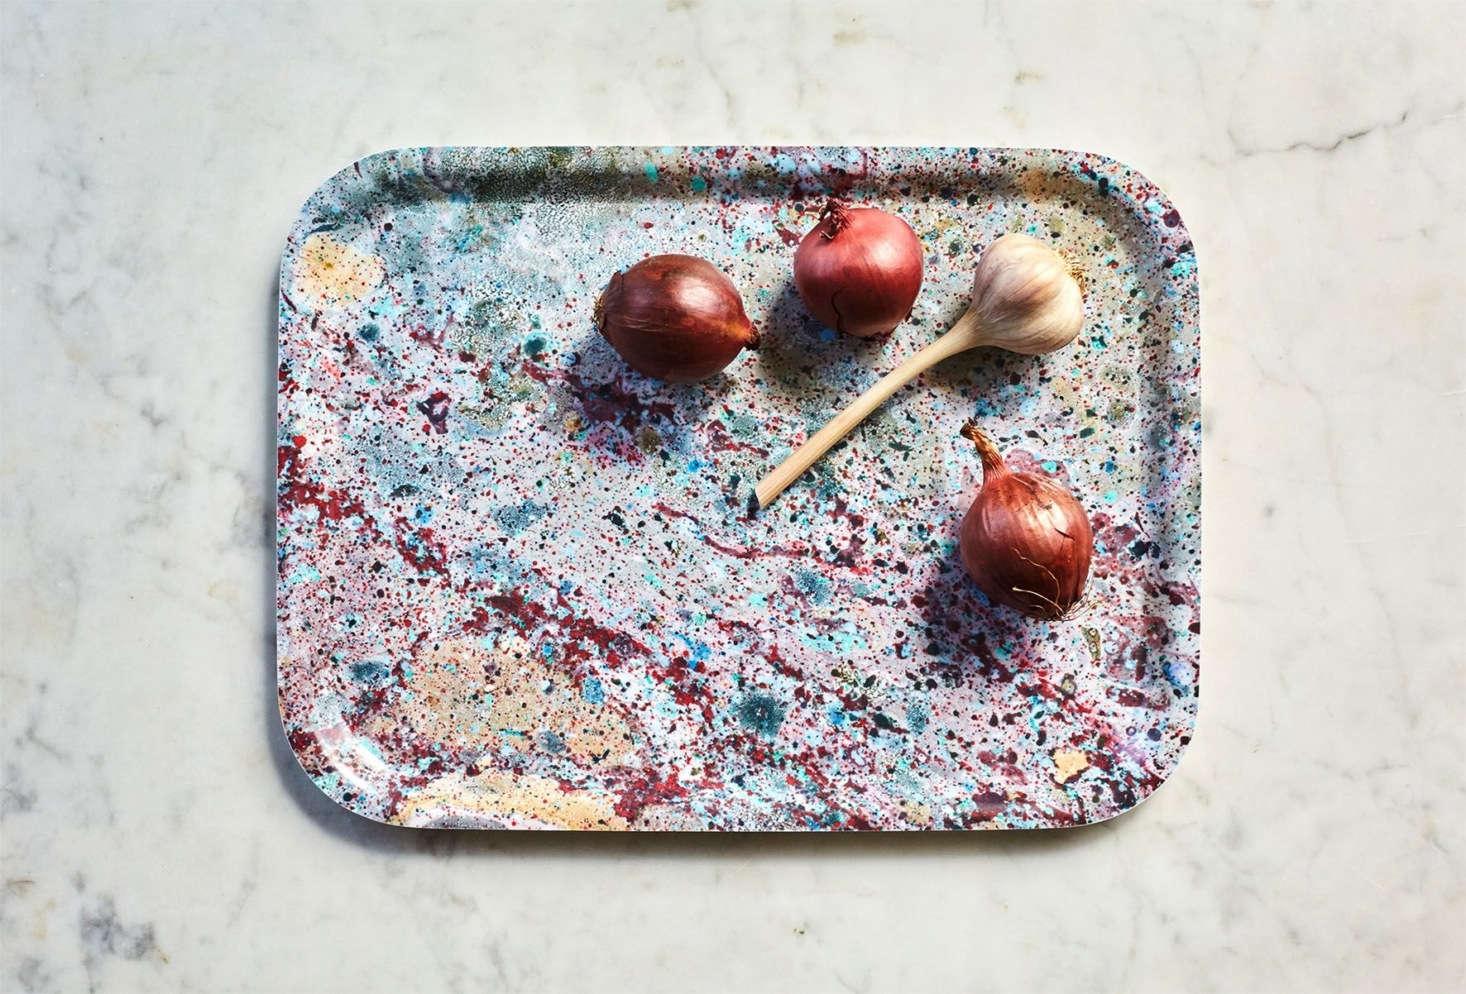 The Autumn Stories Breakfast Tray is9. KR.